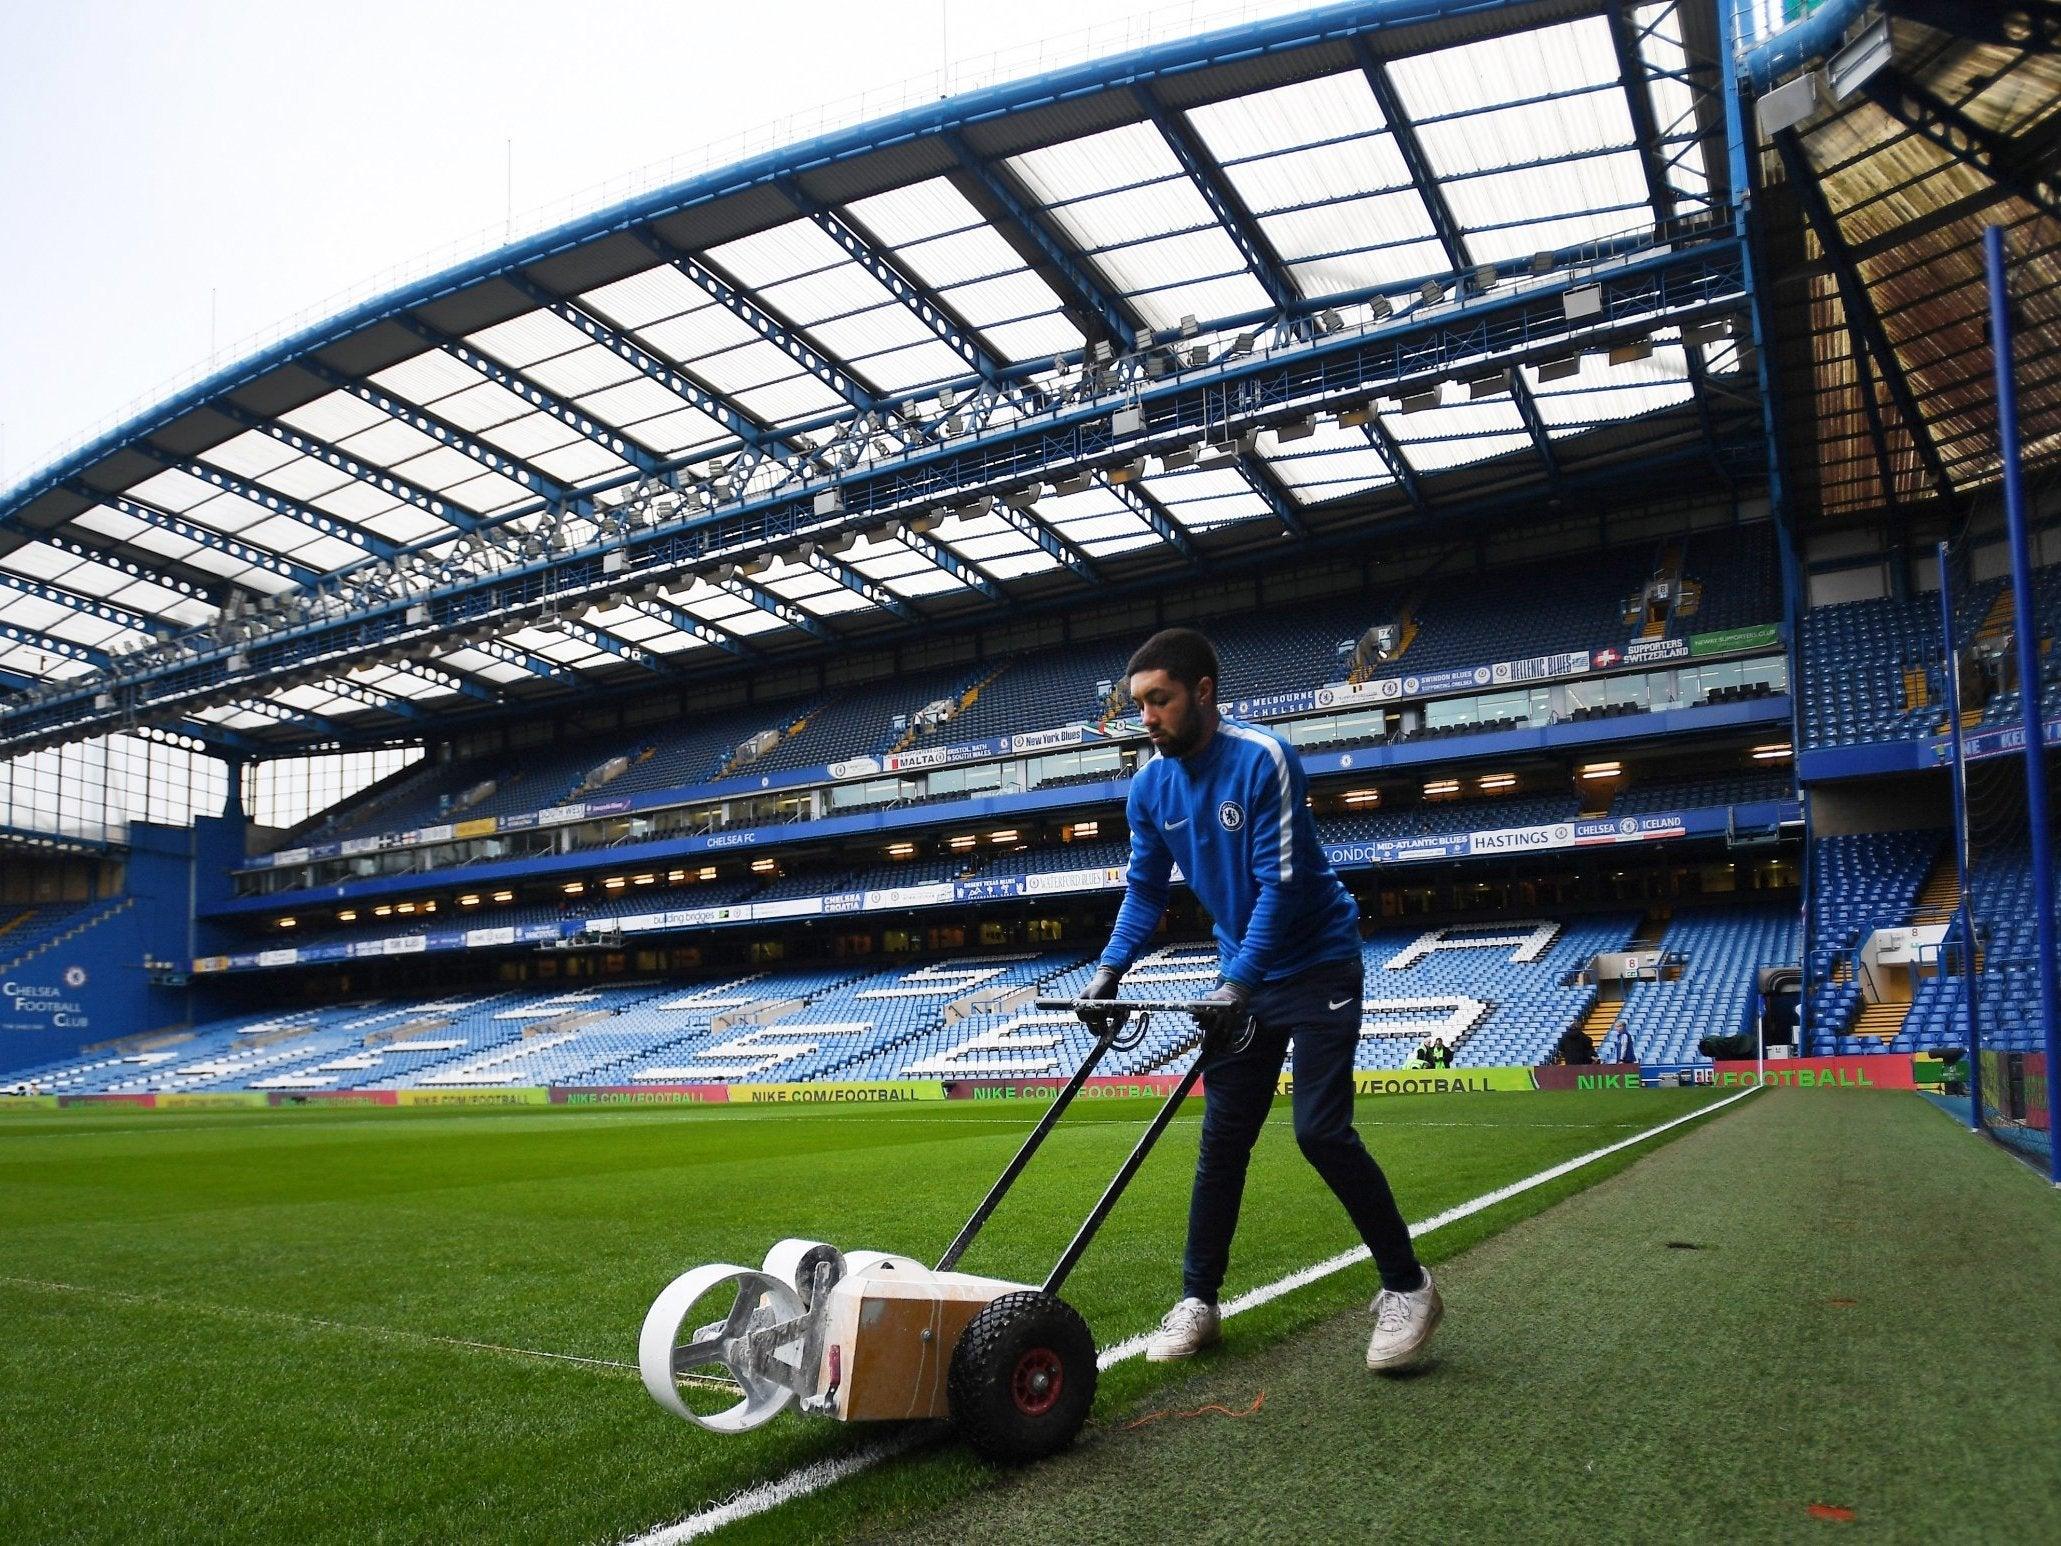 Chelsea vs Man Utd LIVE – stream, score, goals and latest updates from Stamford Bridge